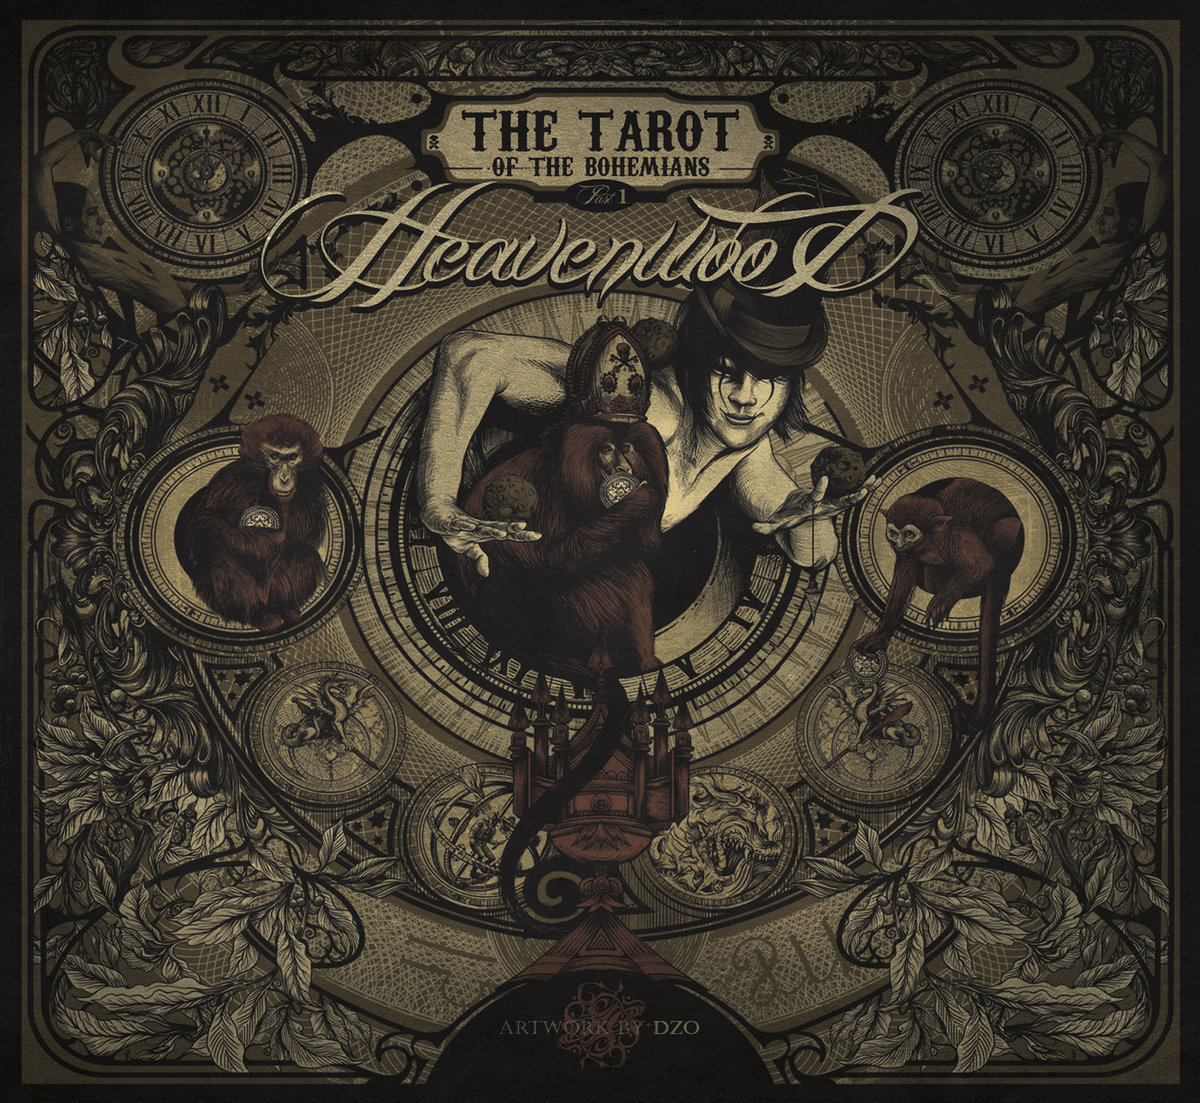 Heavenwood the tarot of the bohemians raising legends package image buycottarizona